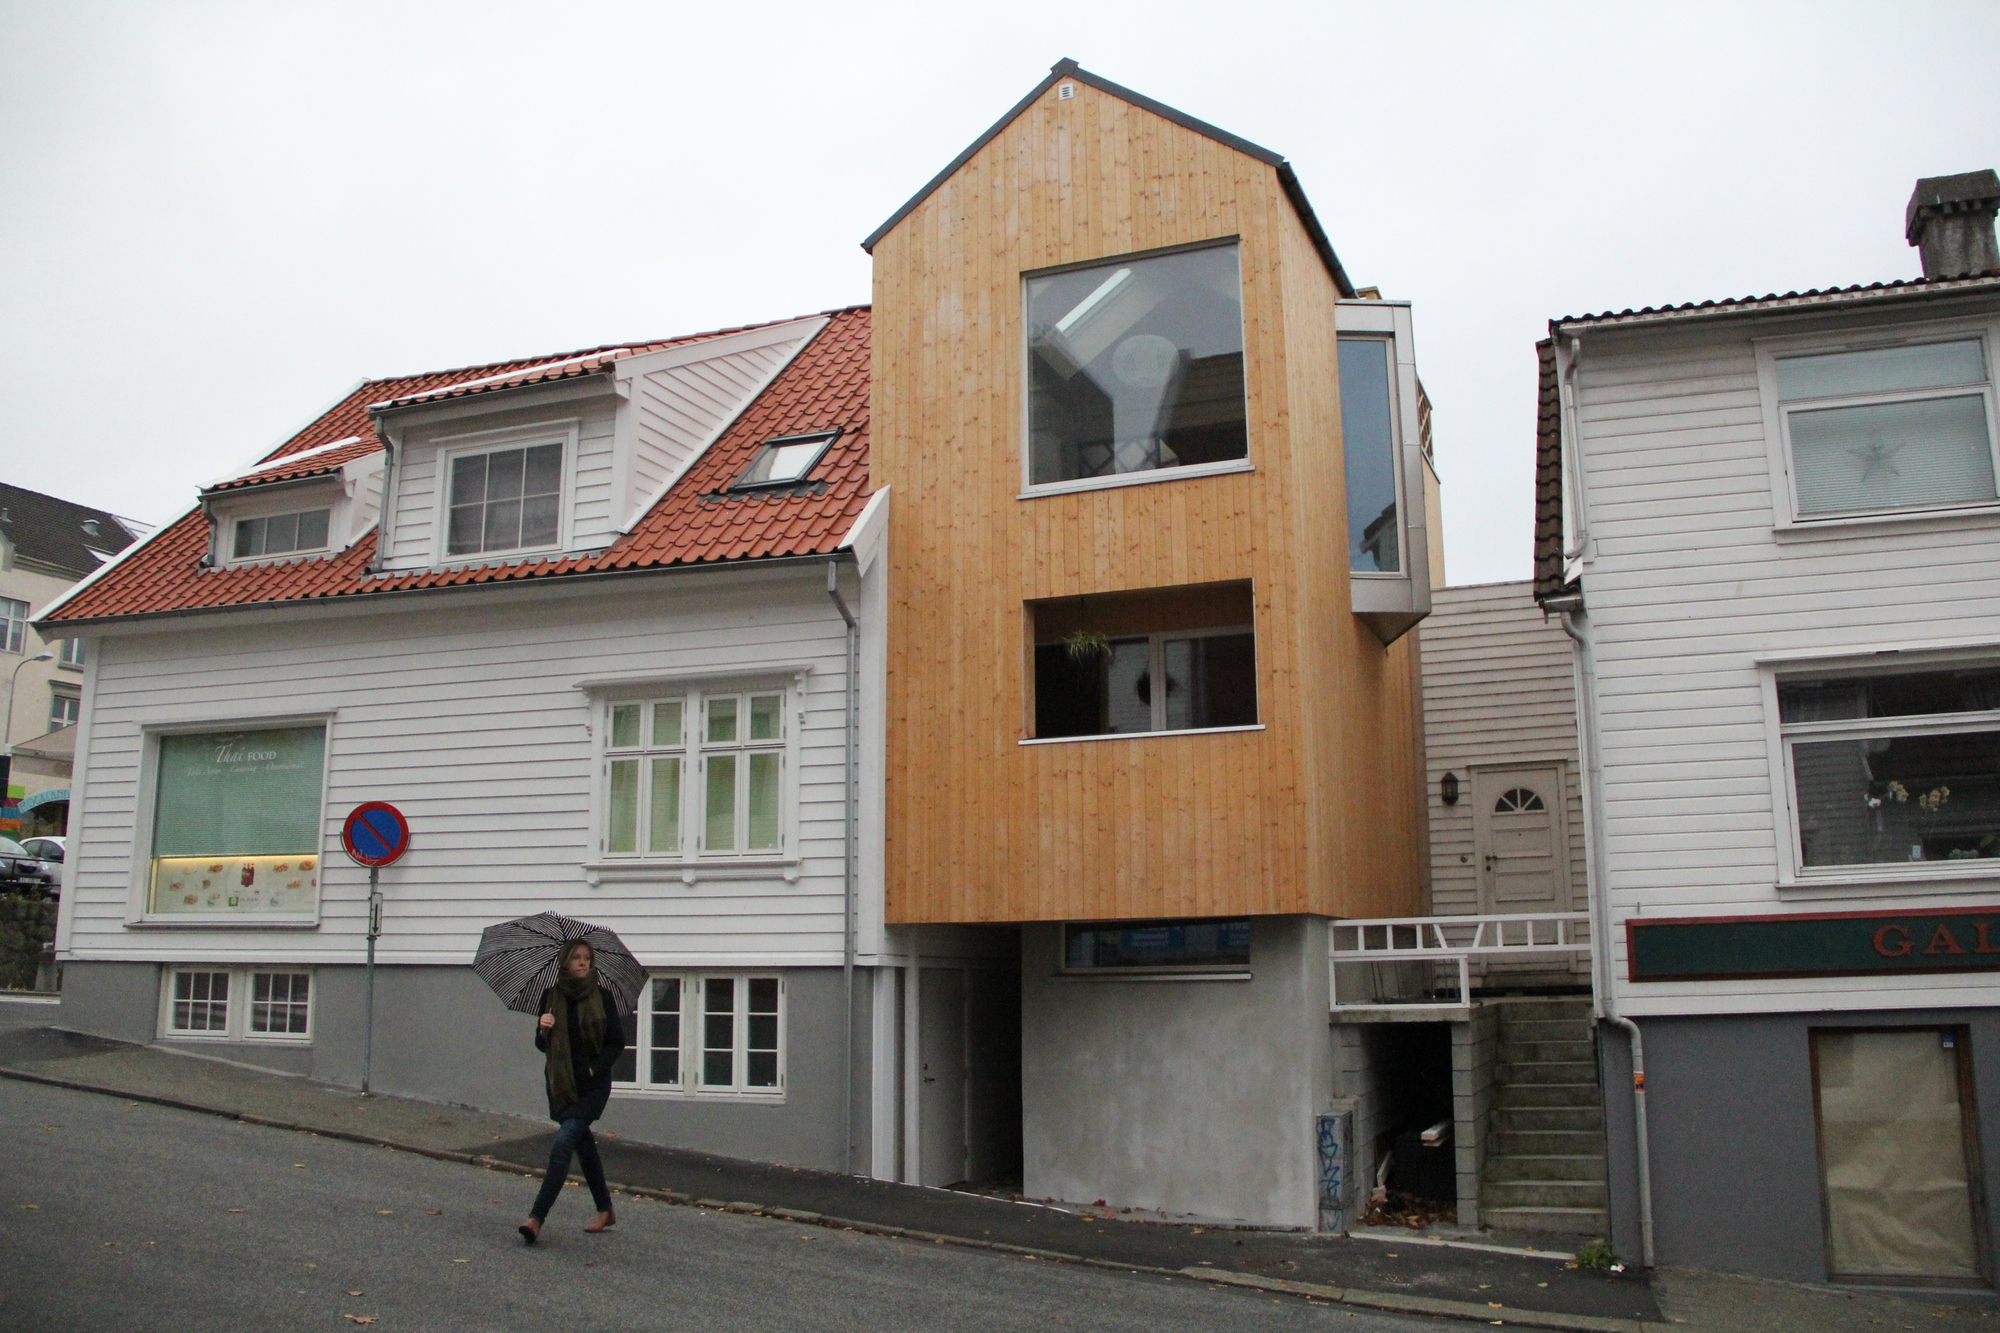 Gallery of house in stavanger austigard arkitektur 7 for House photos gallery